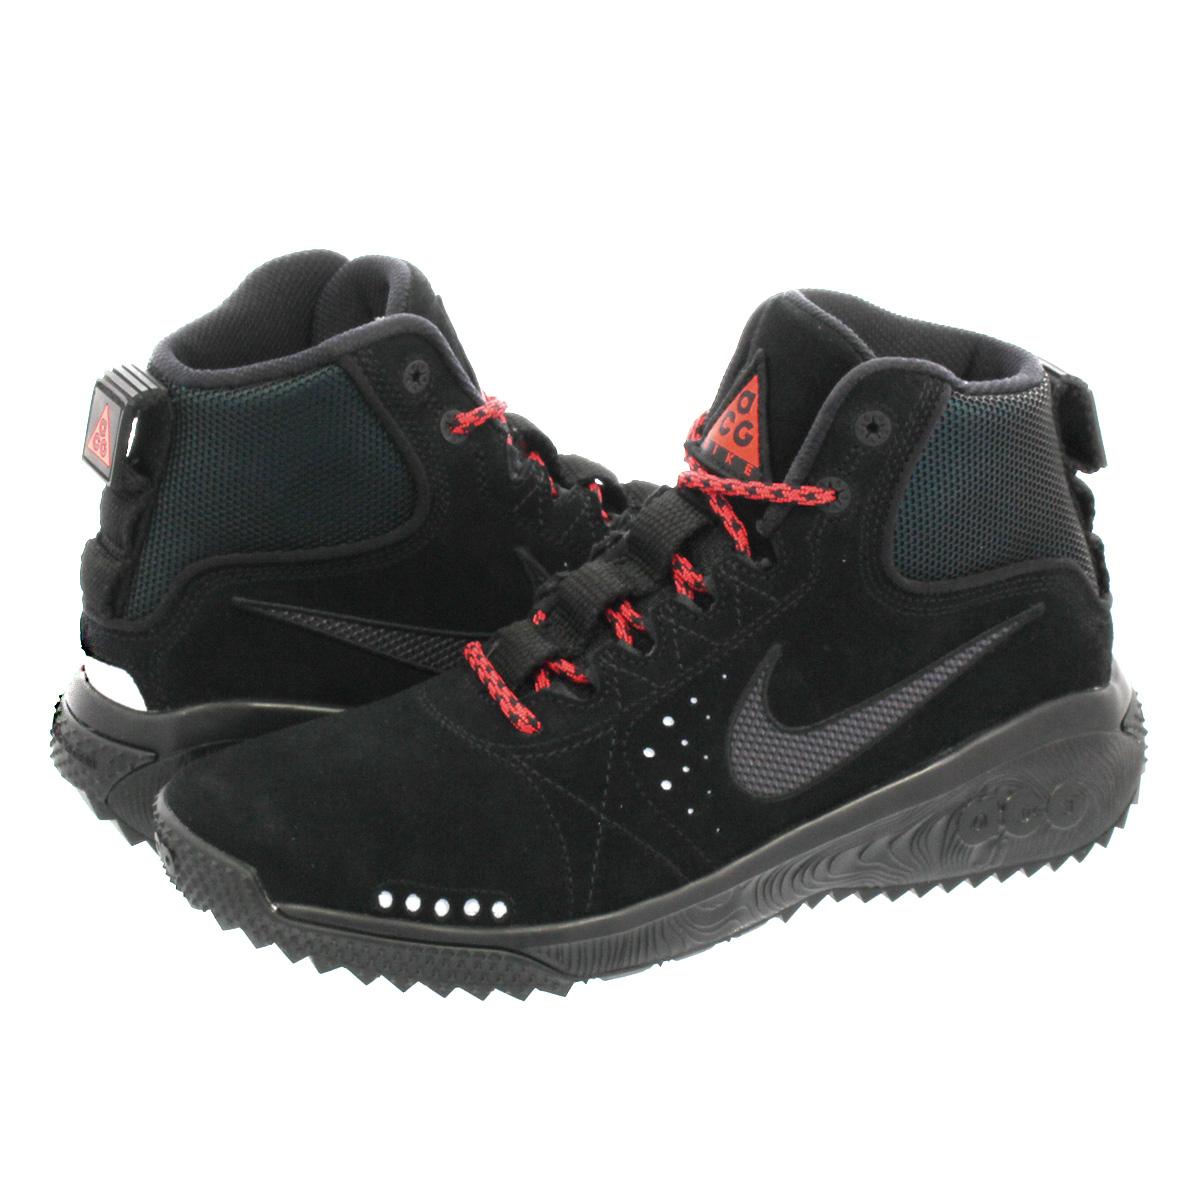 sélection premium 4c13d 0f6c7 NIKE ACG ANGEL' S REST Nike ACG Angels rest BLACK/OIL GREY/THUNDER  GREY/GEODE TEAL aq0917-001